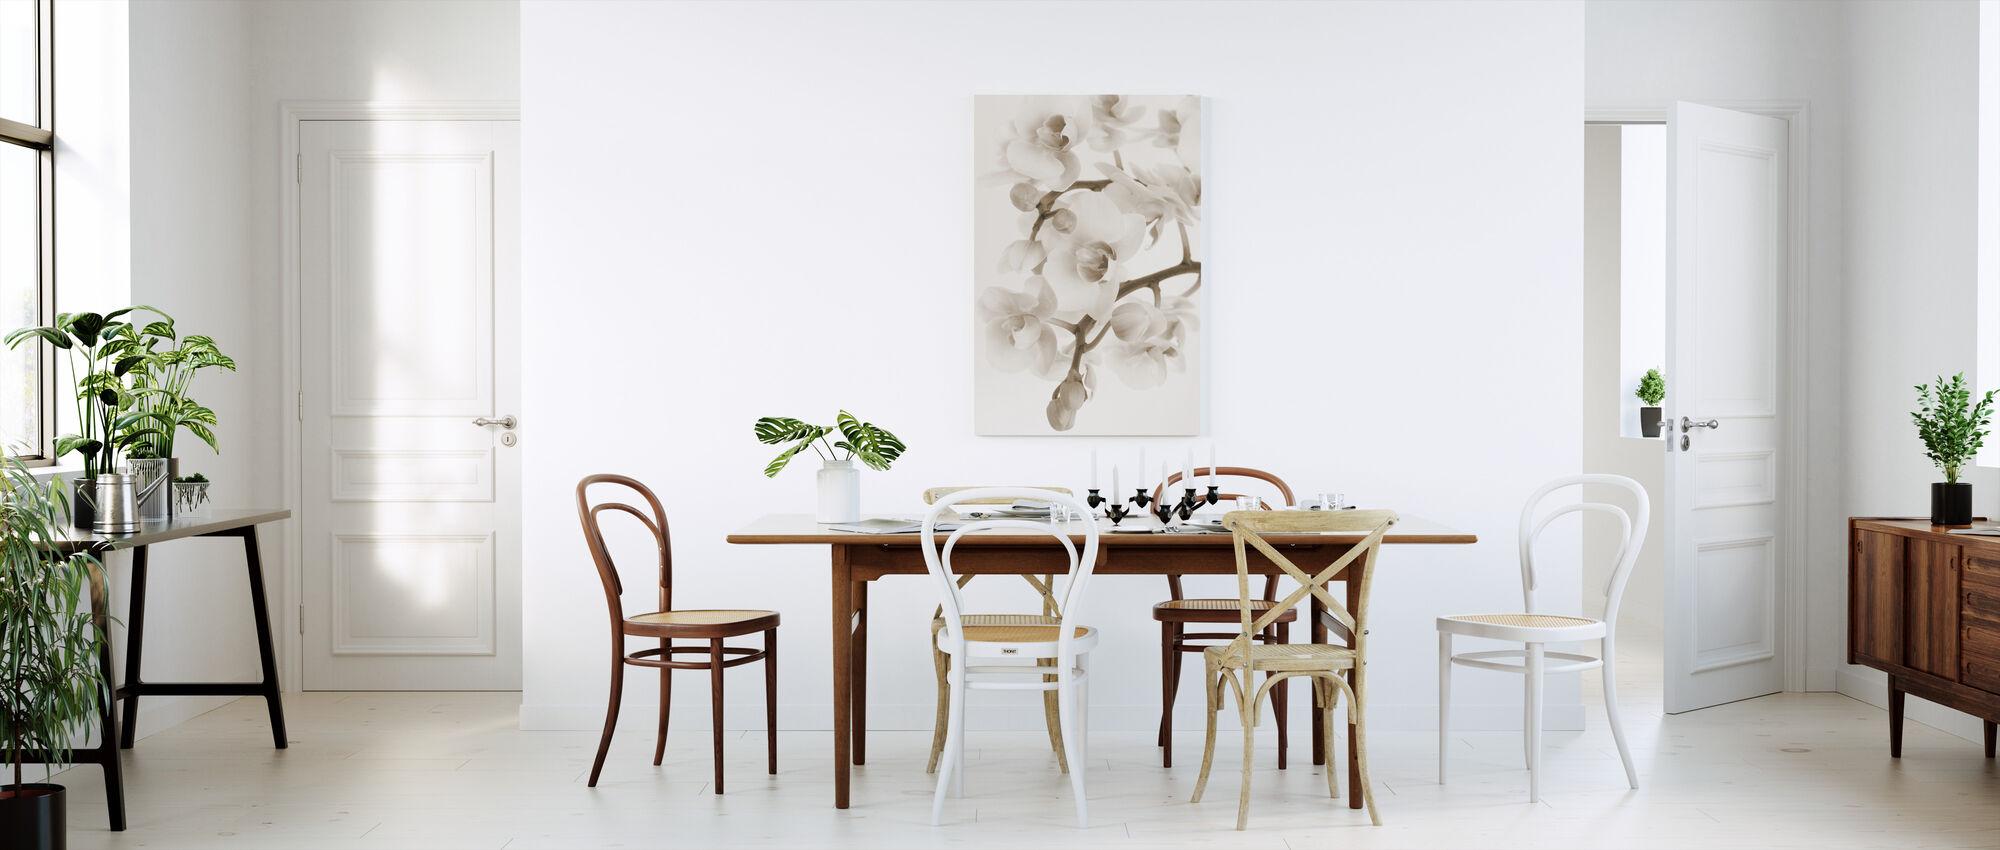 Orchidee - Sepia - Canvas print - Kitchen